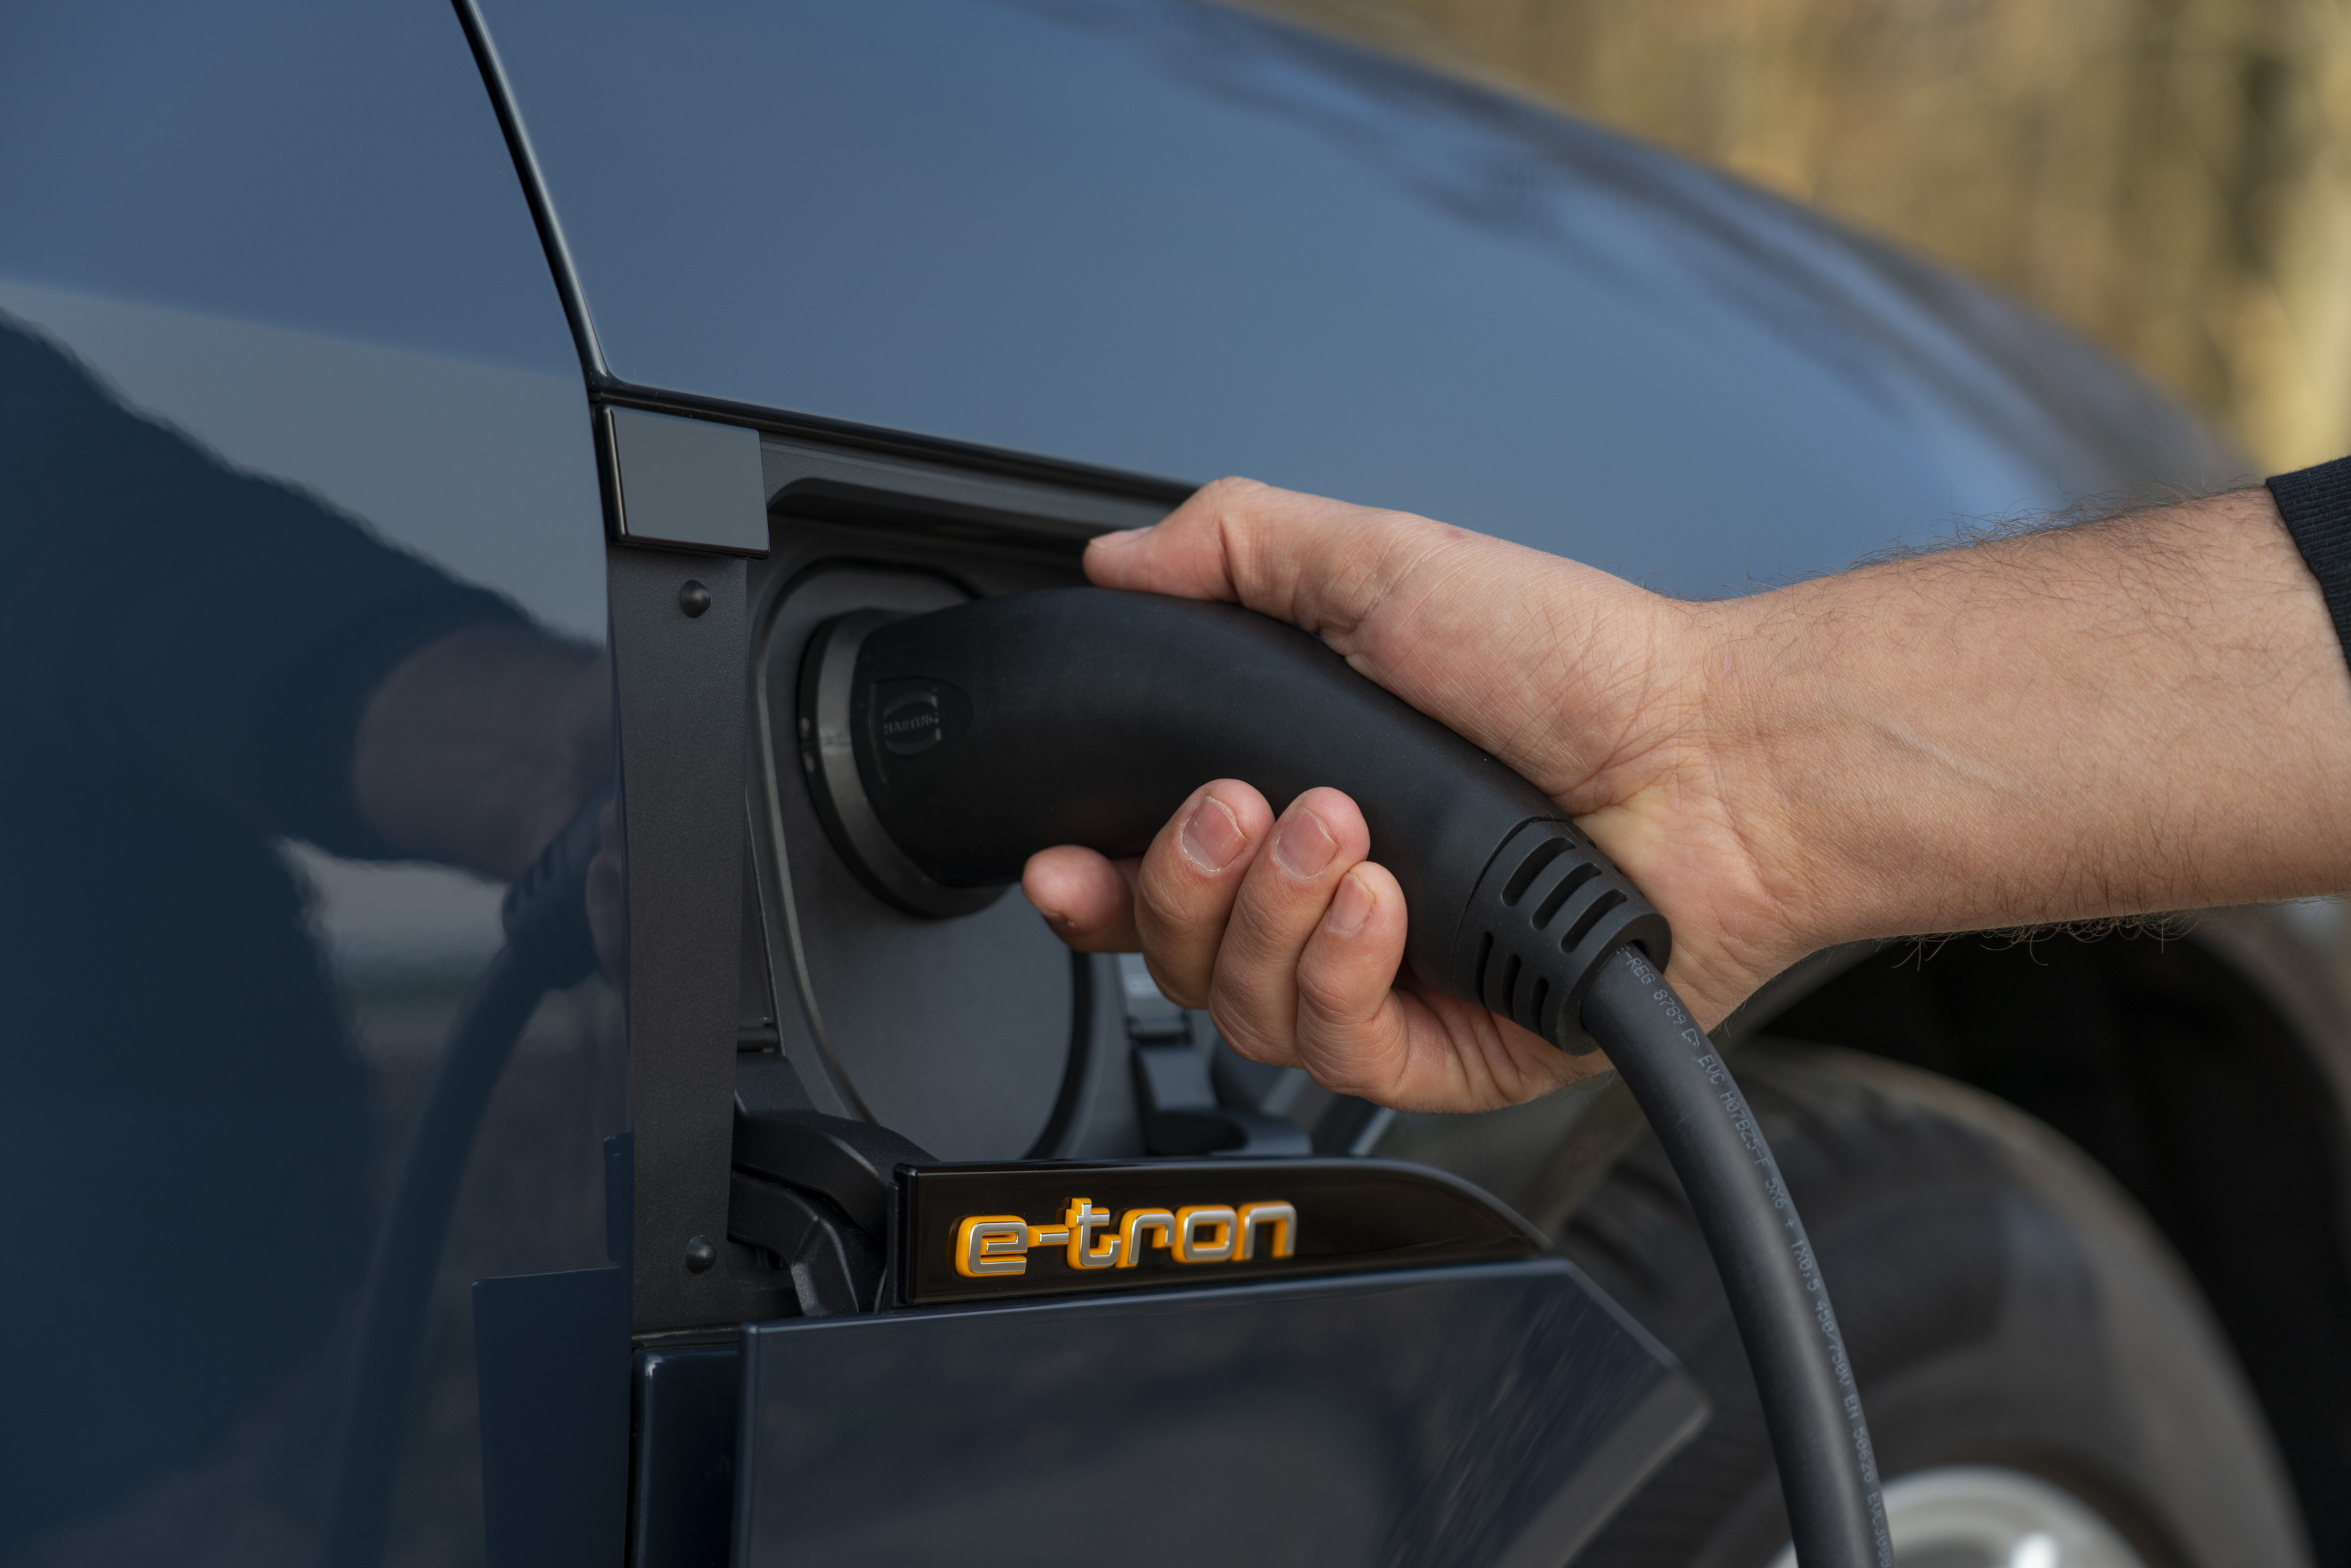 Audi e-tron Sportback 55 quattro charging